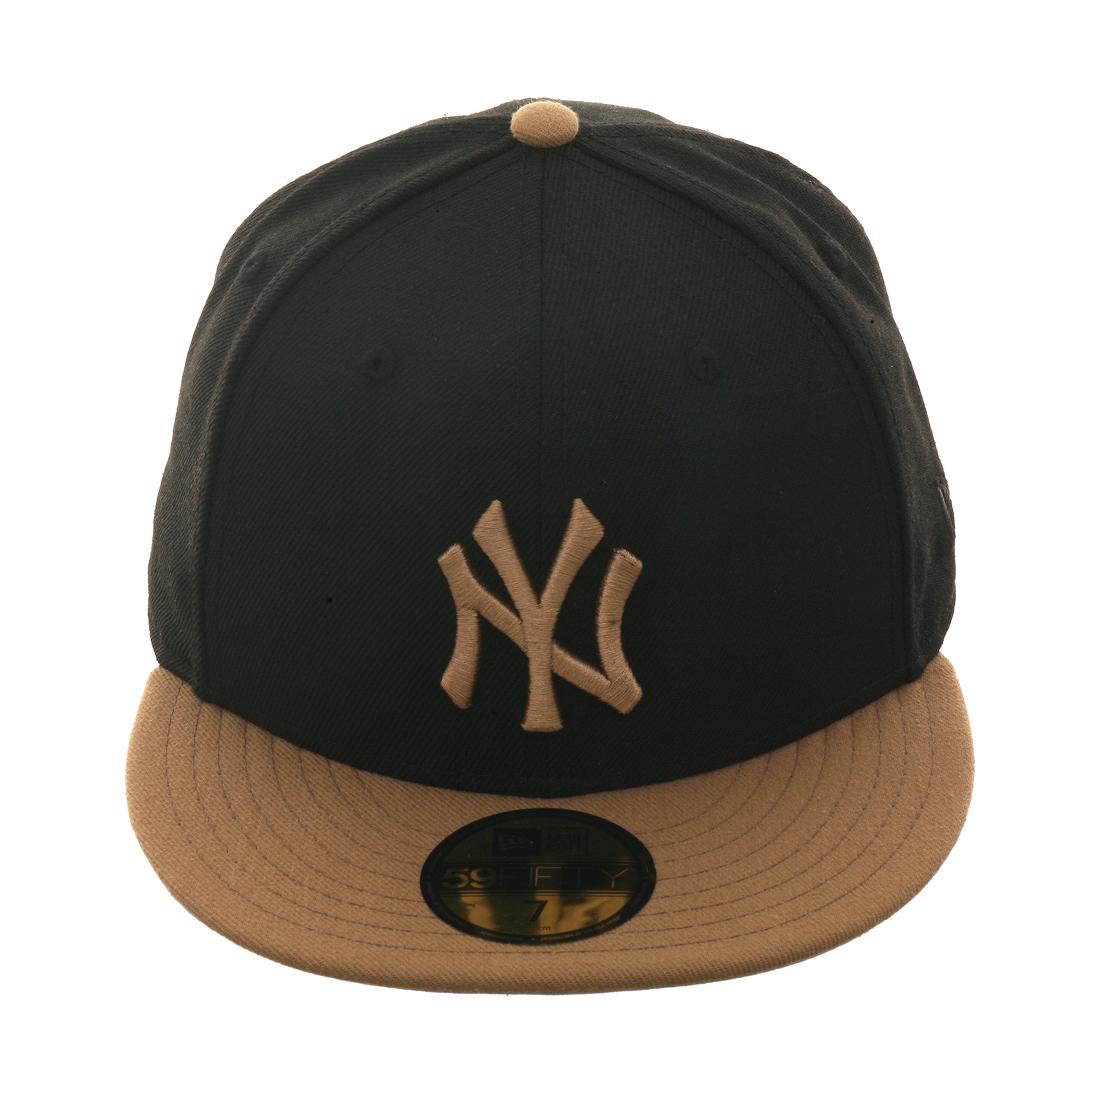 Hat Club Exclusive New Era New York Yankees Fitted Hat - 2T Black 0b12ee53eea